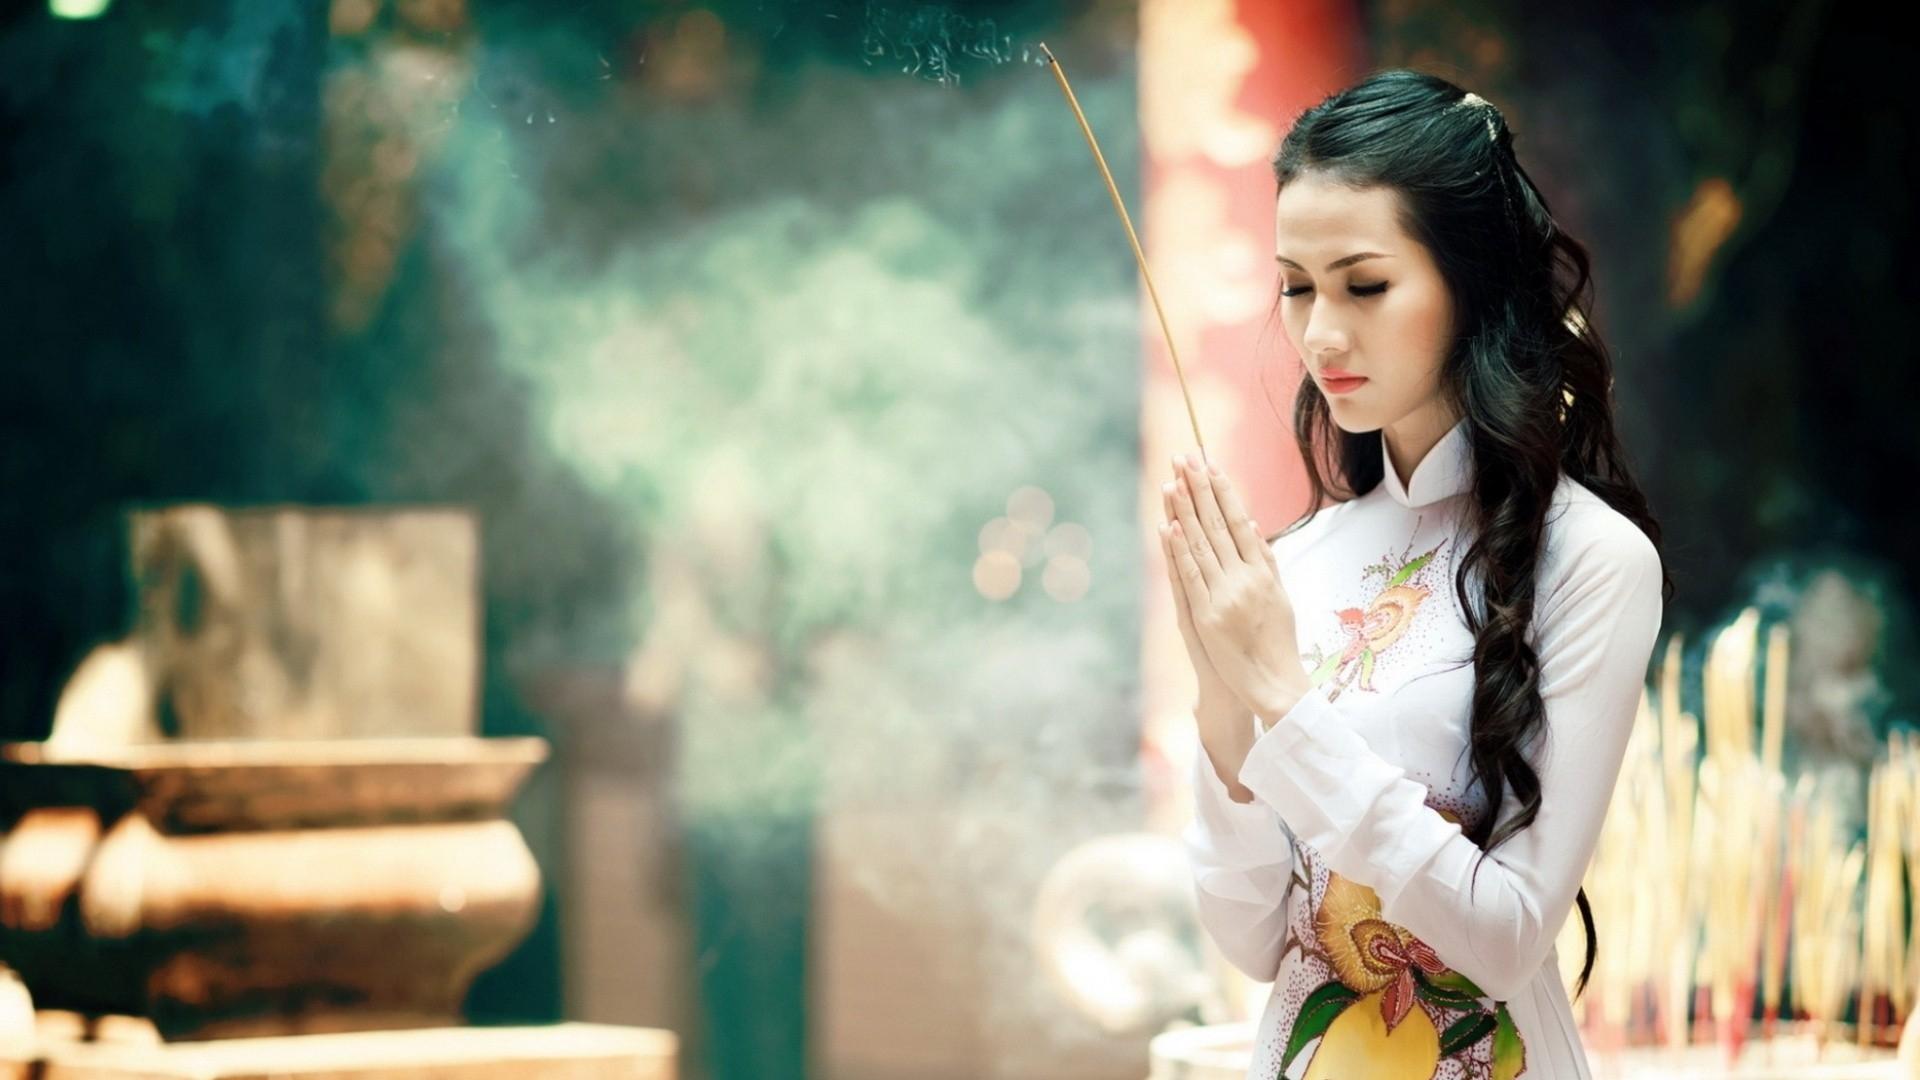 Download wallpaper 1920x1080 girl pray asian kimono aroma full girl pray asian voltagebd Images